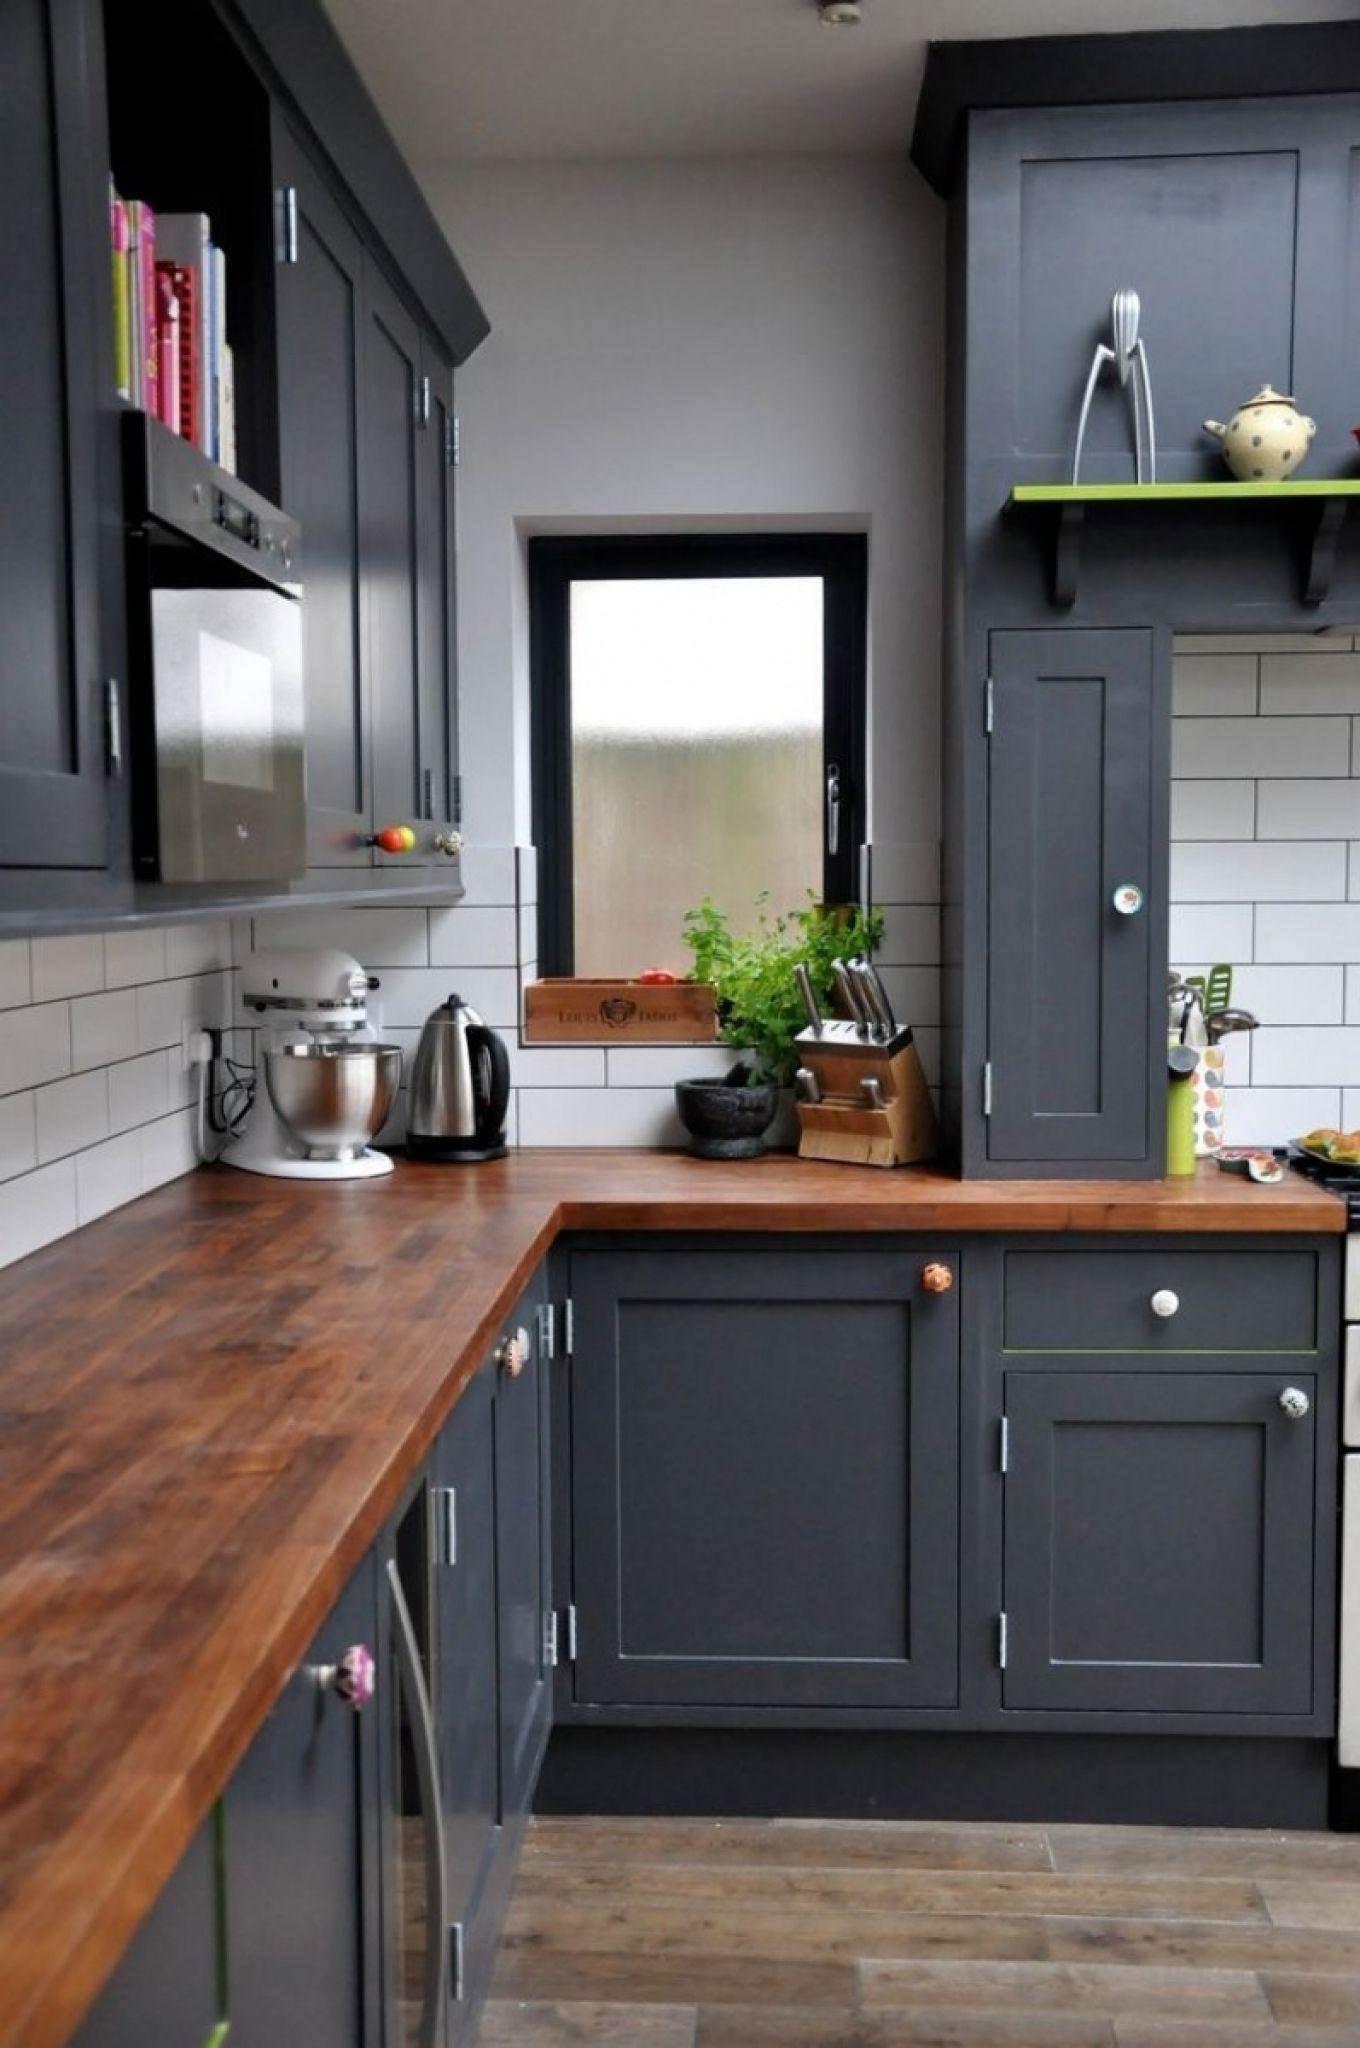 kitchen cabinets rochester ny - small kitchen renovation ideas Check ...